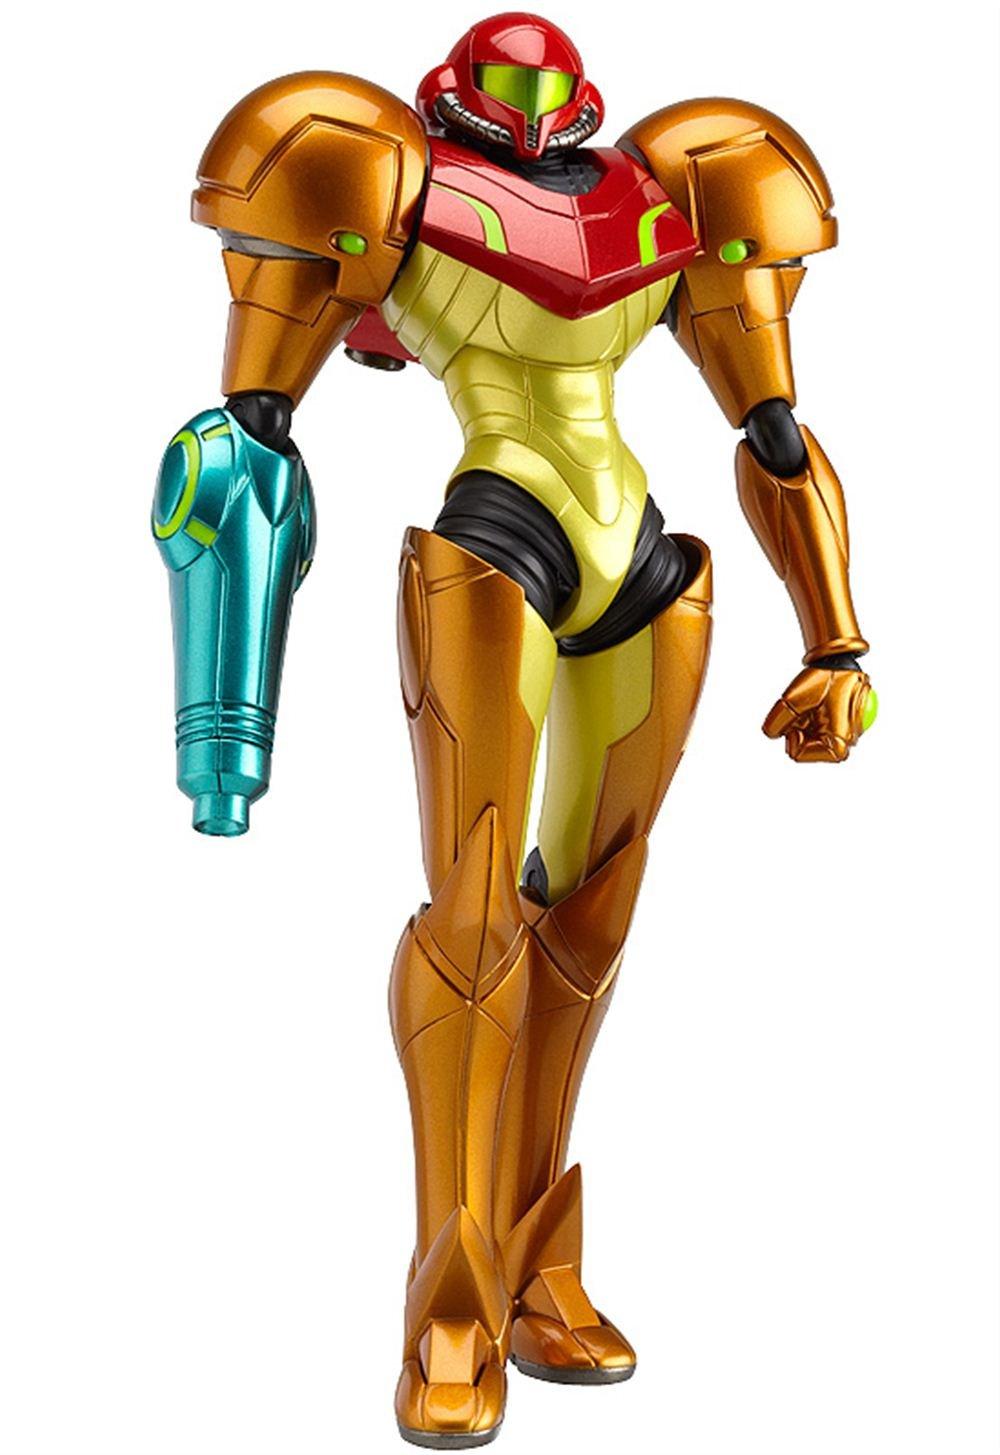 Good Smile C - Figurine - Metroid - Samus Aran Aran Aran Figma - 4545784062210 833da5